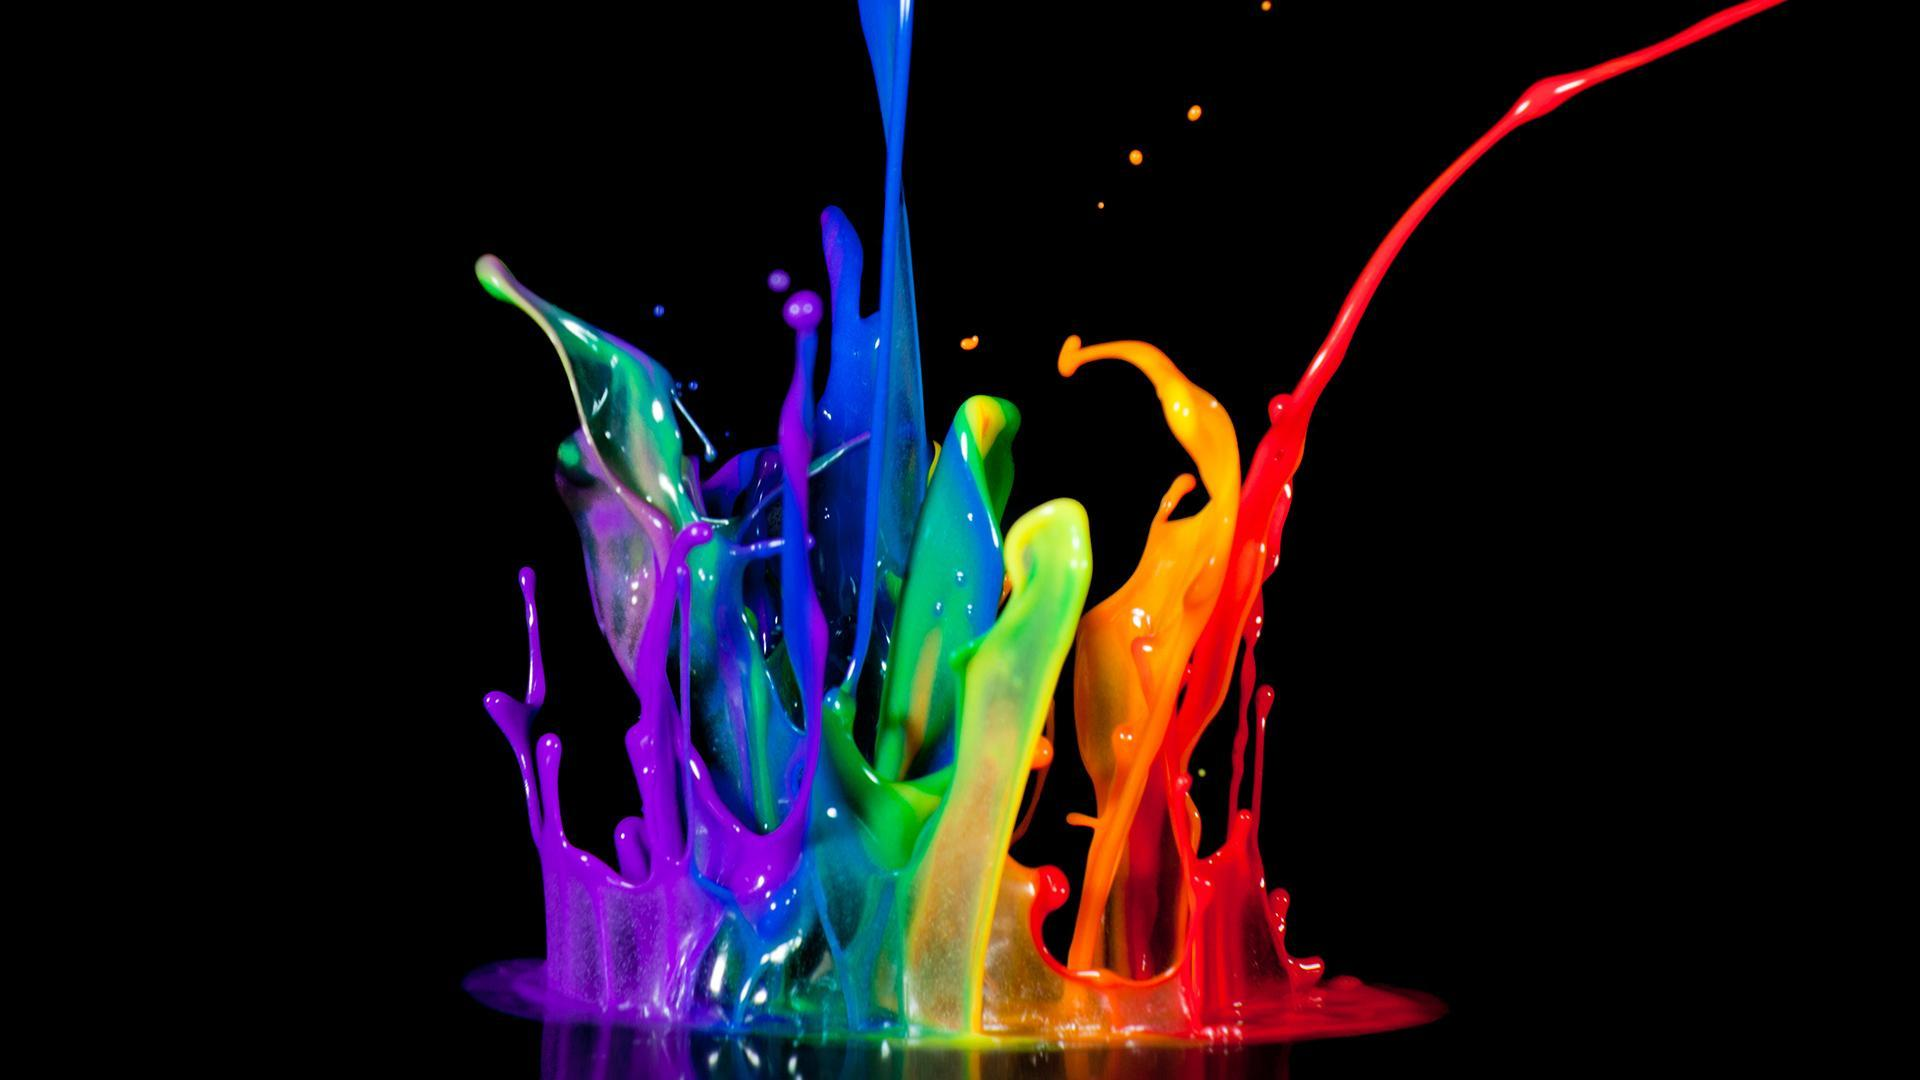 hd wallpapers splash art - photo #22